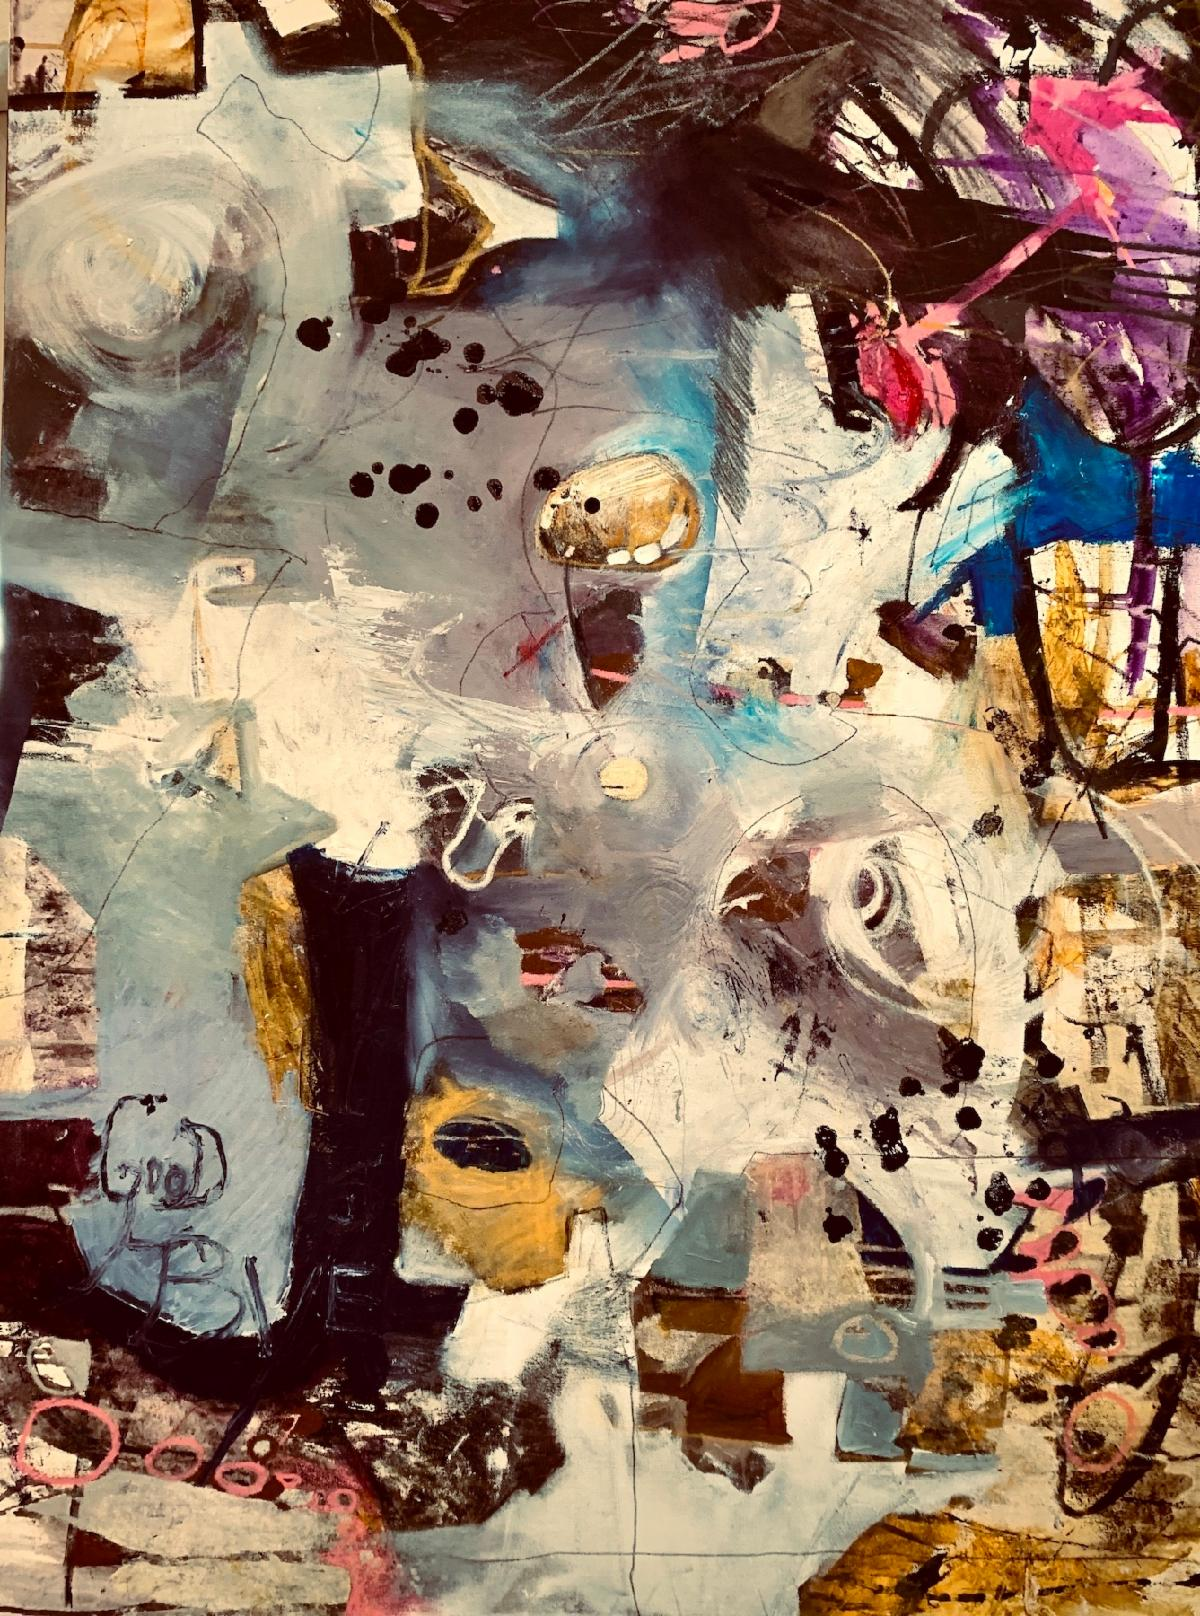 Goodbye, acrylic painting by Eileen Olson